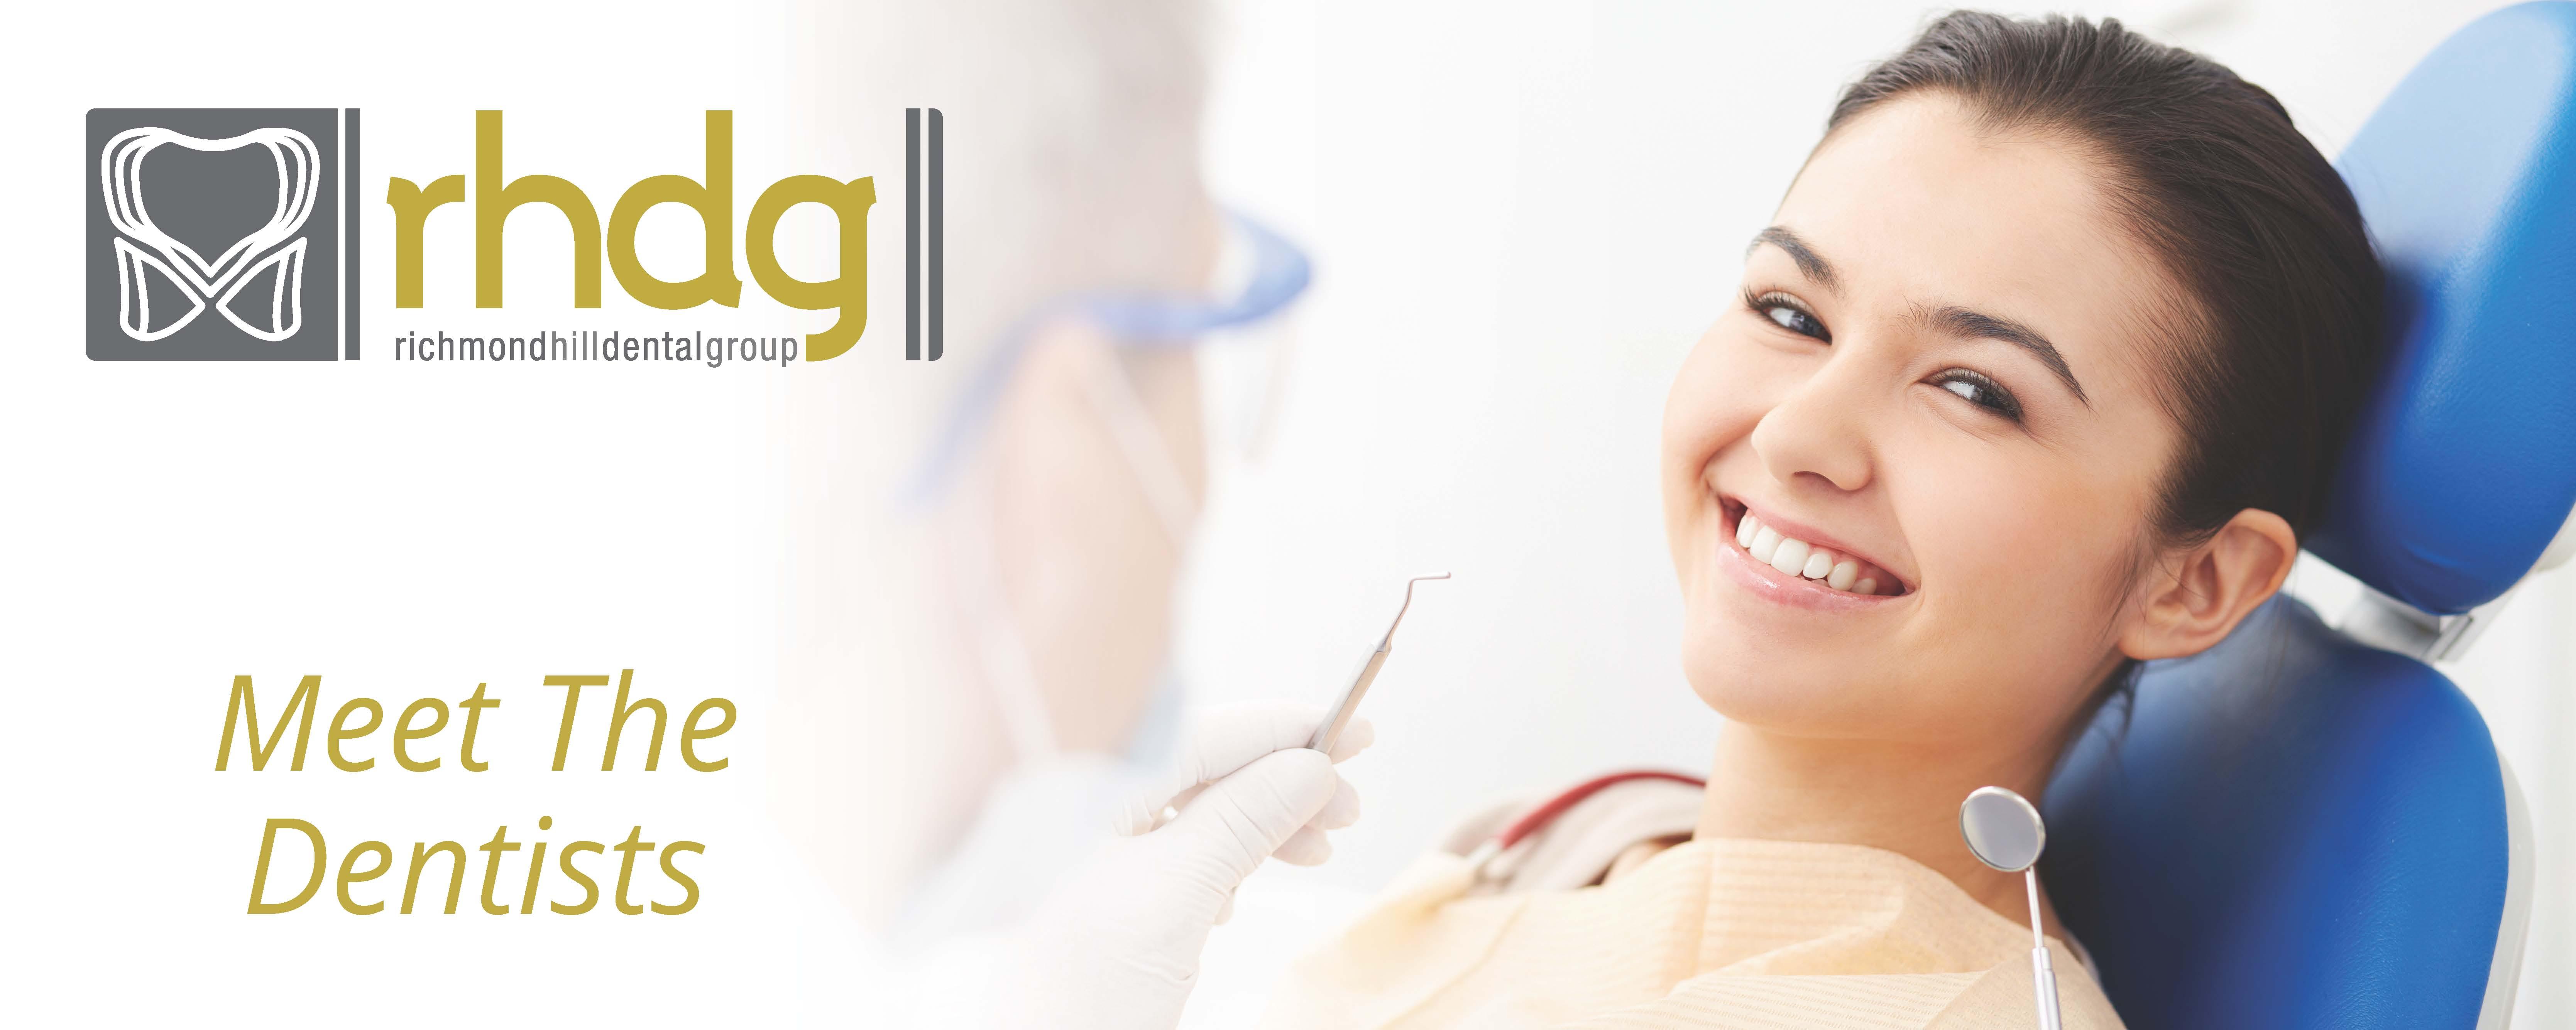 Richmond Hill Dental Group | Toronto Dentist | Meet The Dentists